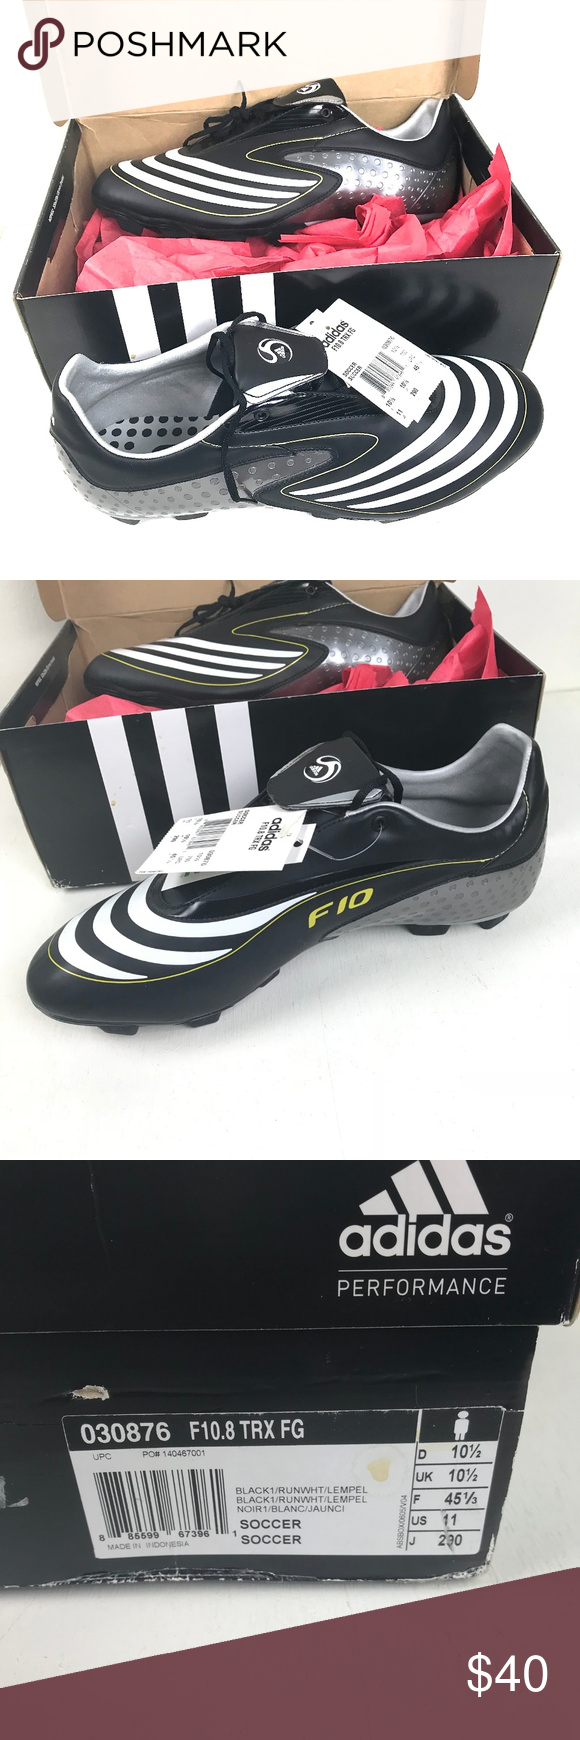 b9ff766f43cce Adidas Men's Soccer Cleats F10.8 TRX FG Size 11 M Adidas Men's ...